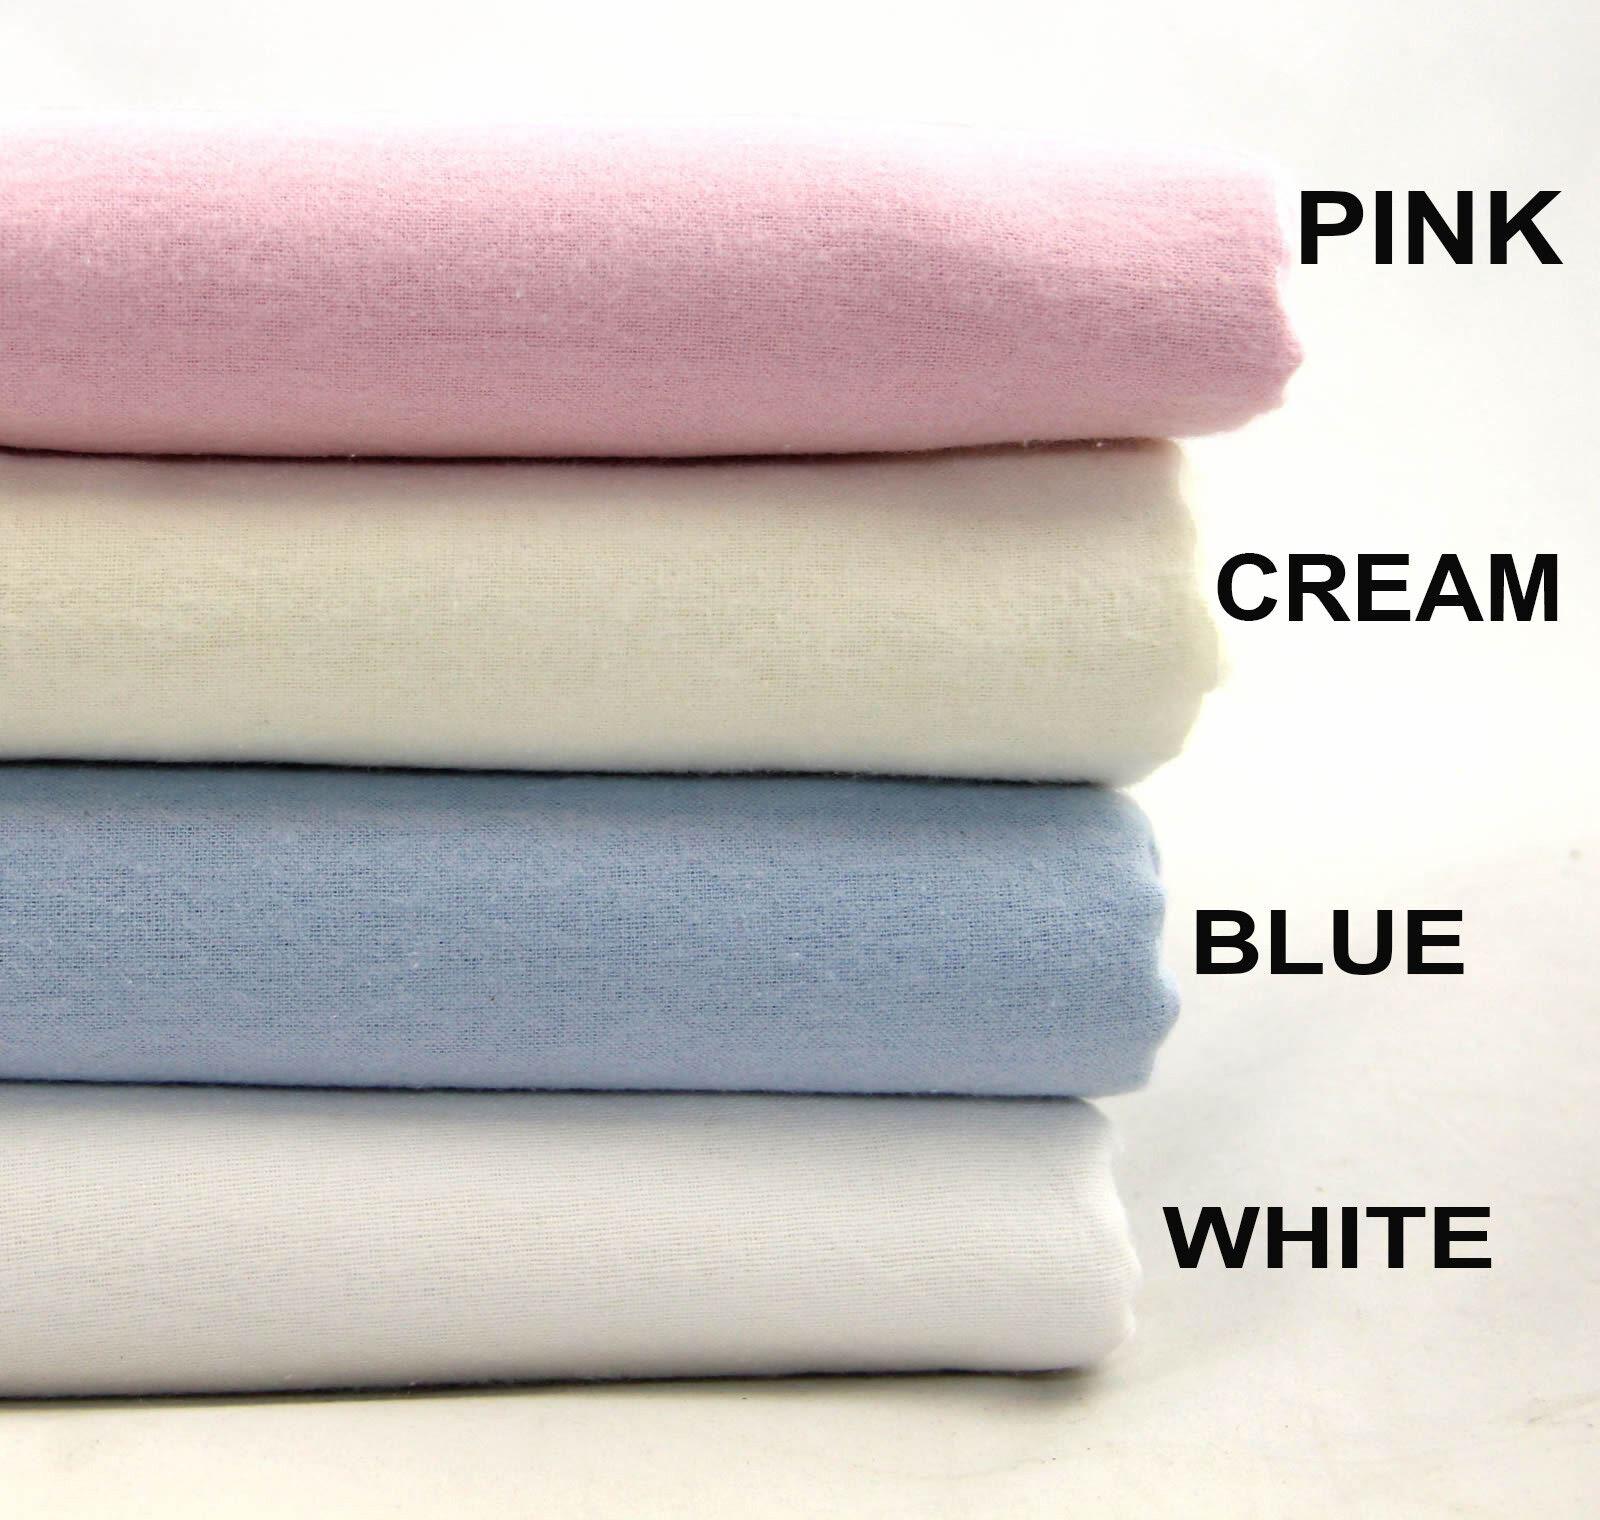 King Double Soft Fleece Flannelette Sheet Set 100/% Cotton Bedding Single